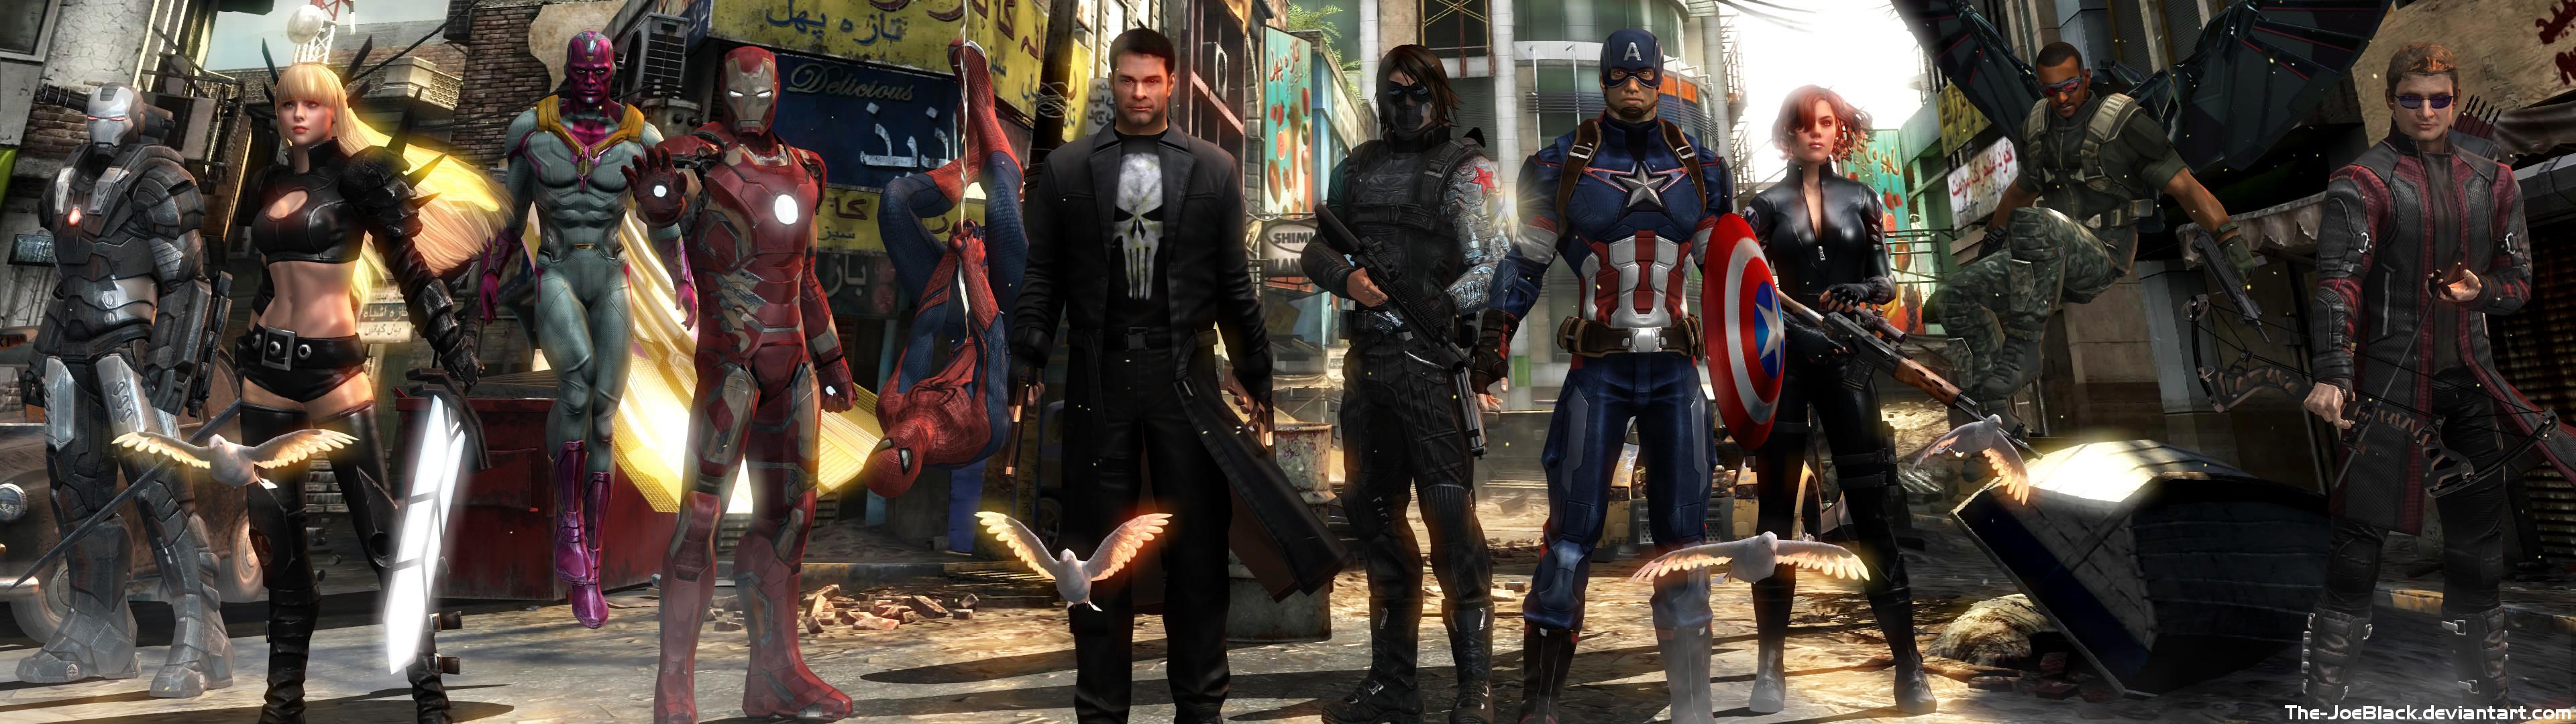 Avengers – Dual Screen Wallpaper by The-JoeBlack.deviantart.com on  @DeviantArt